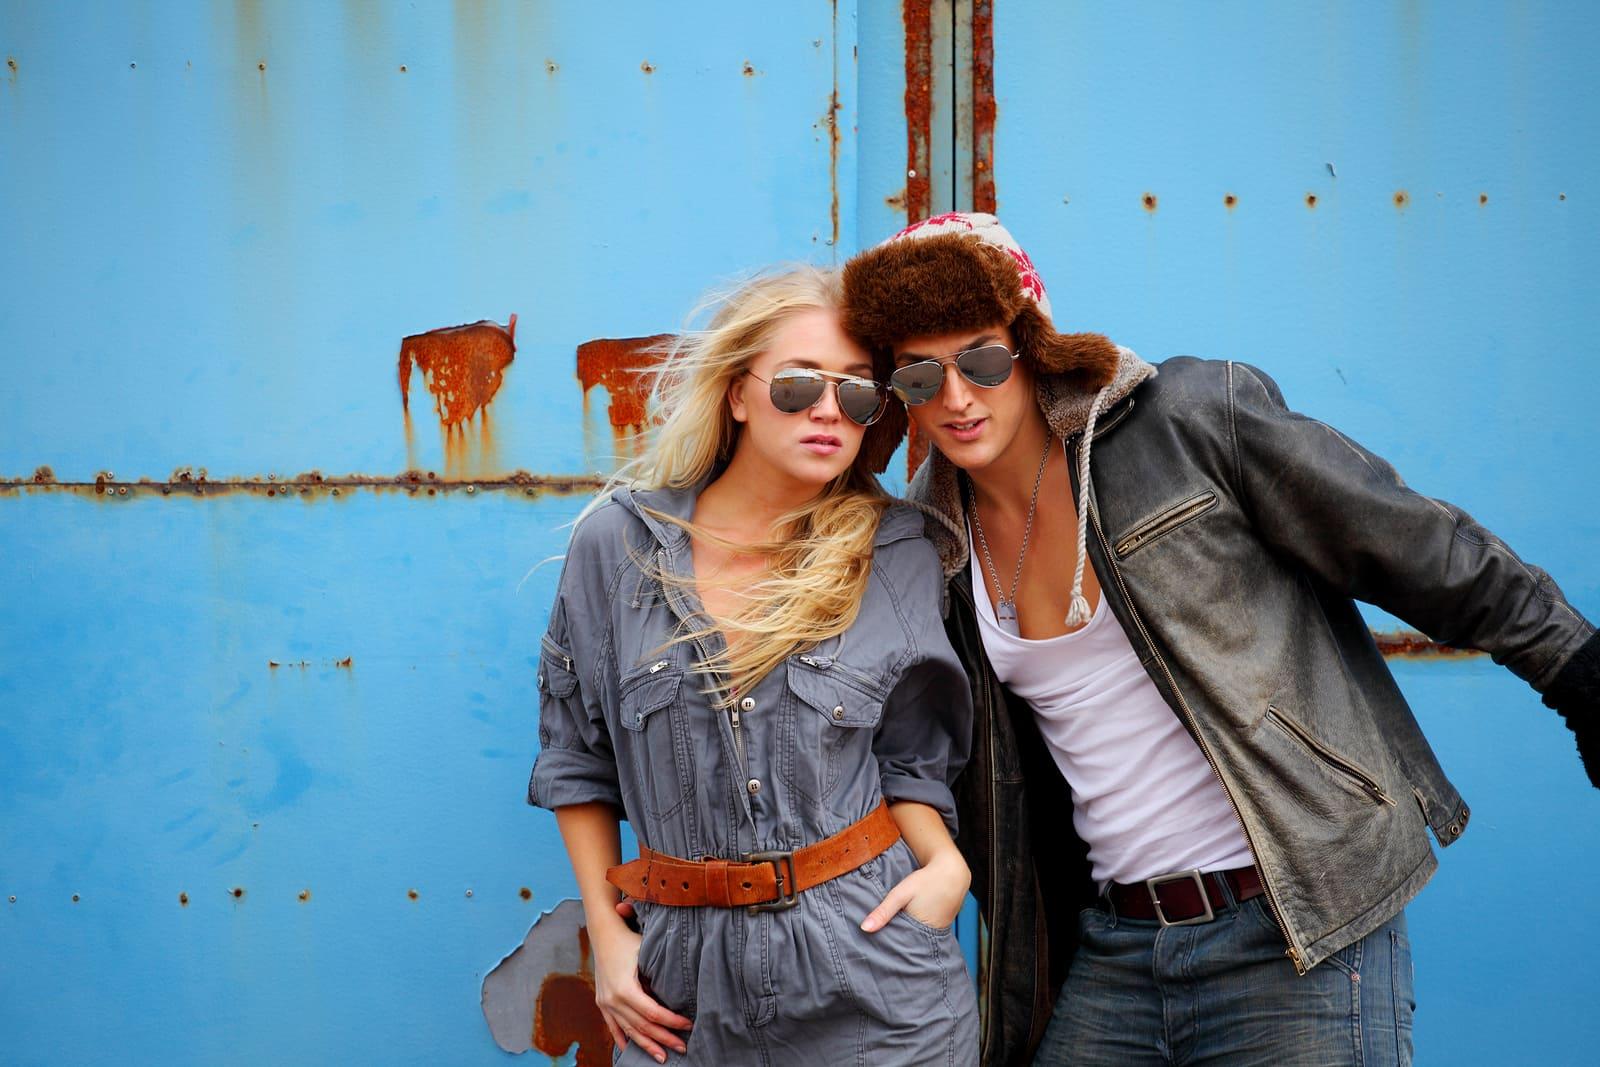 Millennials: What Do 'Grown-Up Relationships' Look Like?